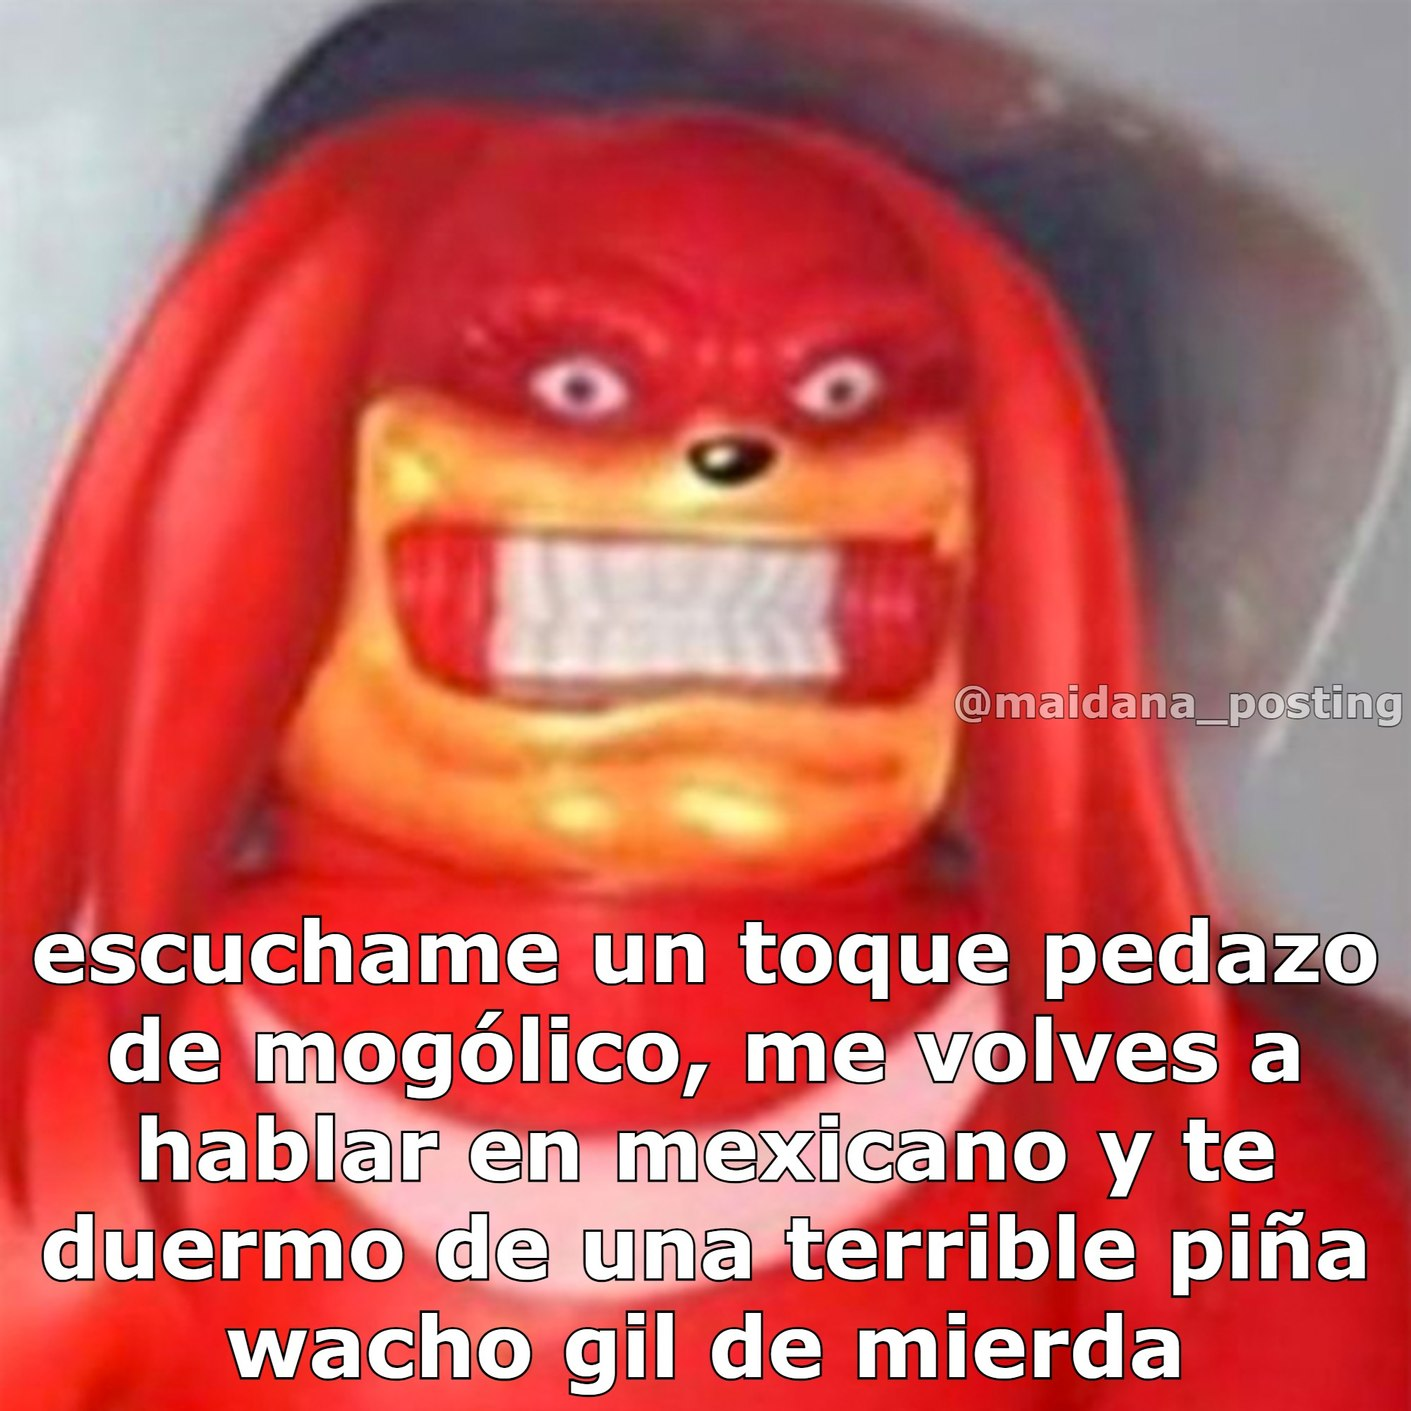 Argentino que hable como mexicano = -1 Argentino - meme